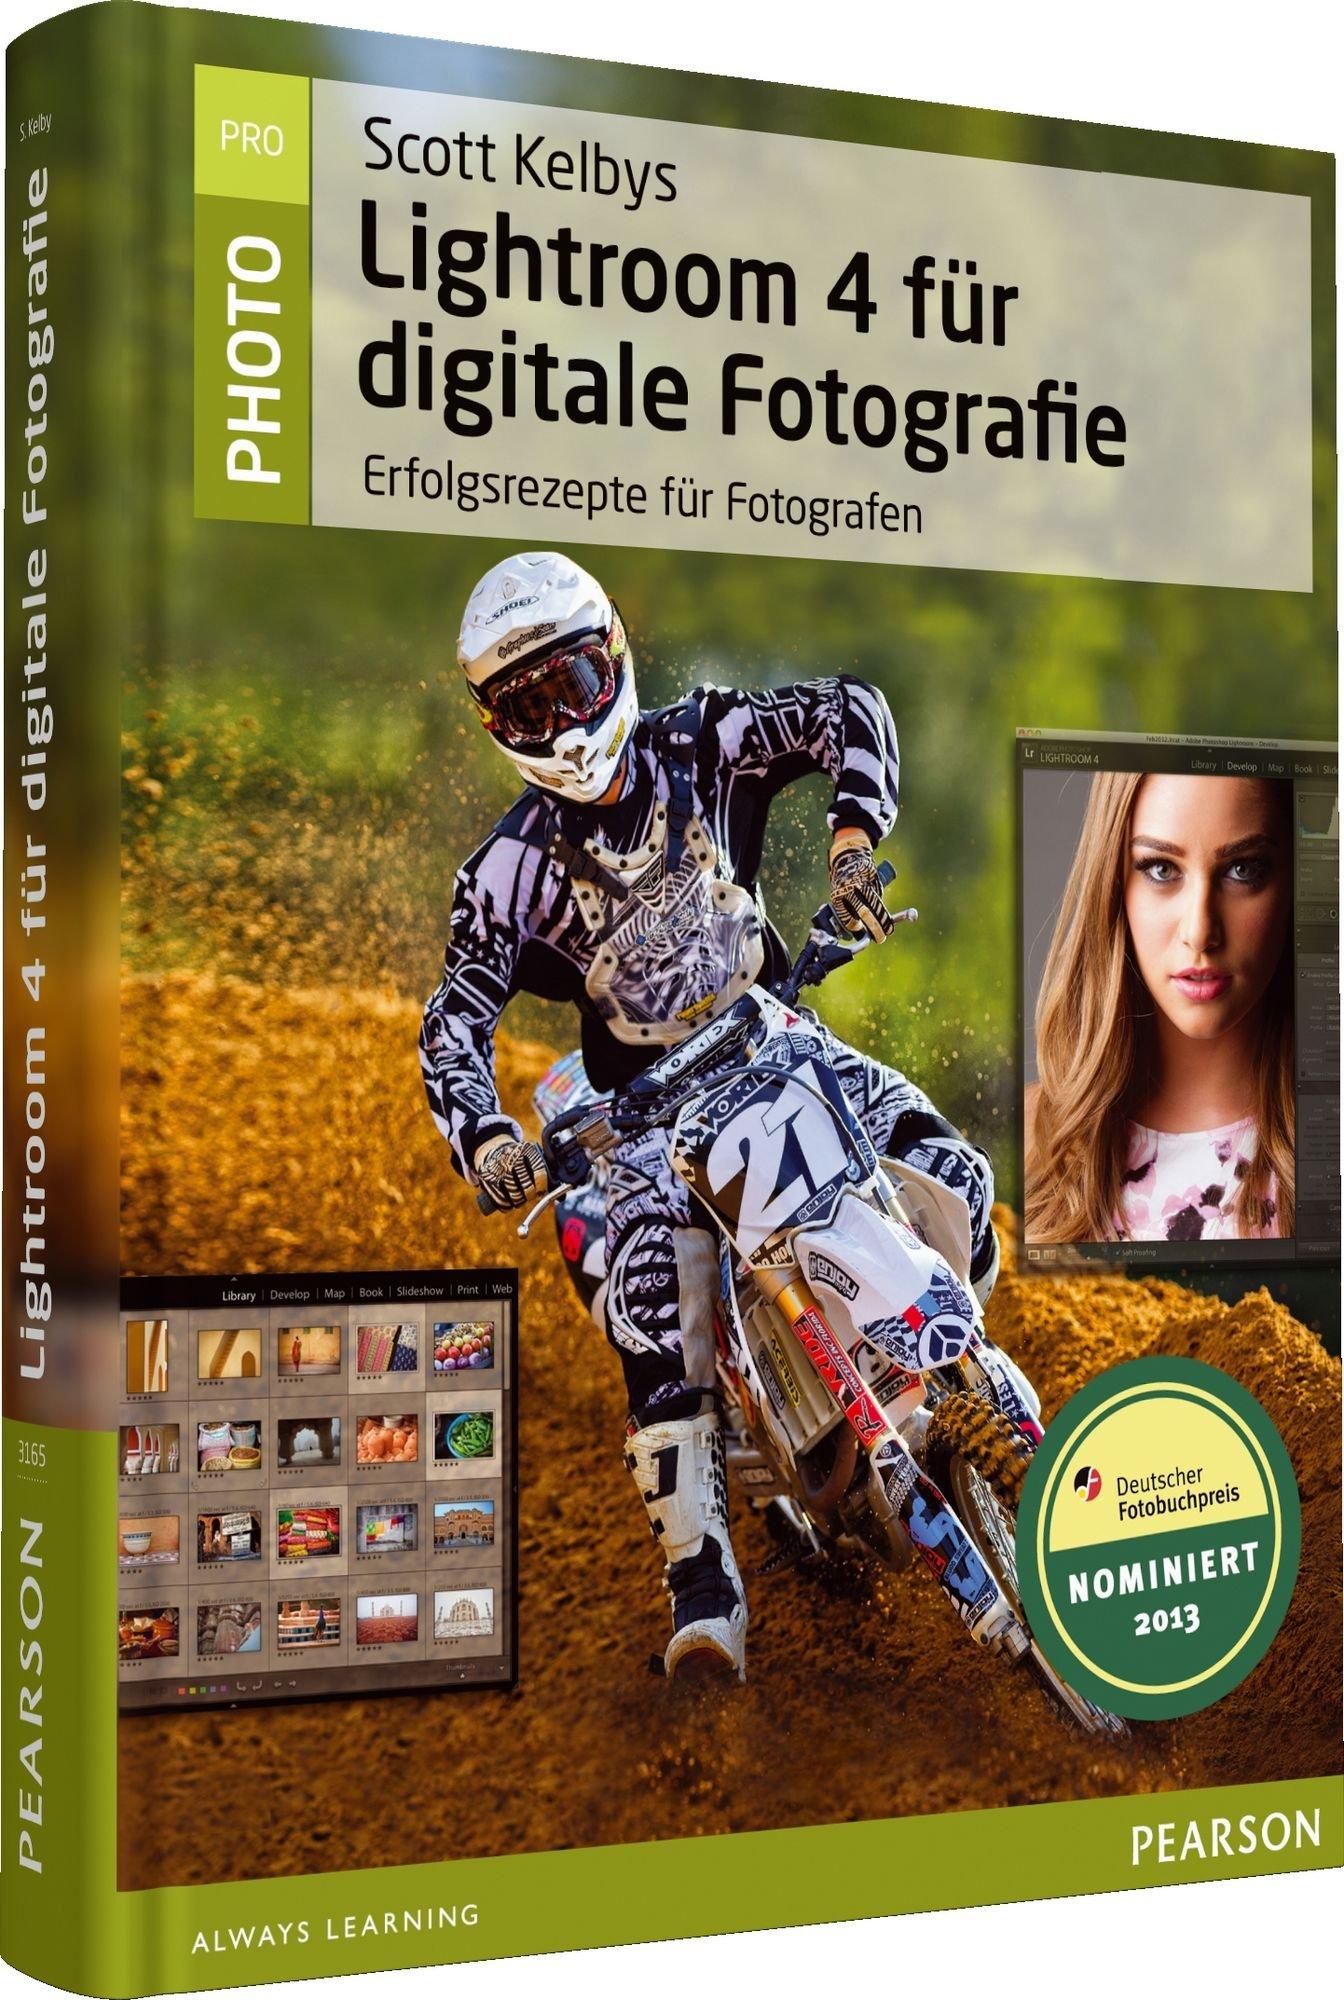 Scott Kelbys Lightroom 4 für digitale Fotografie (Pearson Photo) Gebundenes Buch – 1. September 2012 Addison-Wesley Verlag 382733165X Anwendungs-Software Digitalkamera